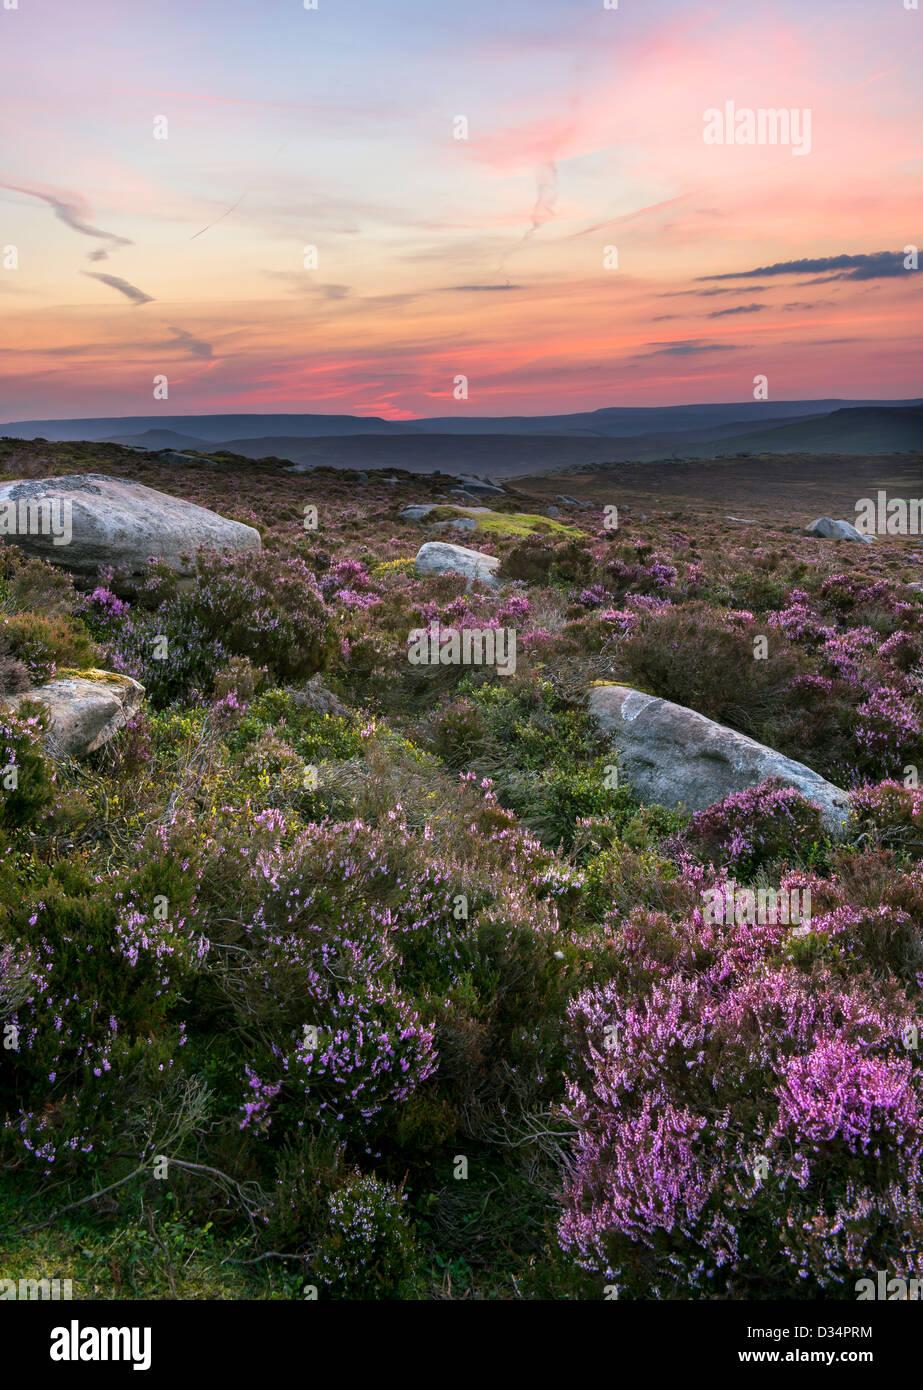 Sunset on Stanage Edge, Peak District, Derbyshire - Stock Image